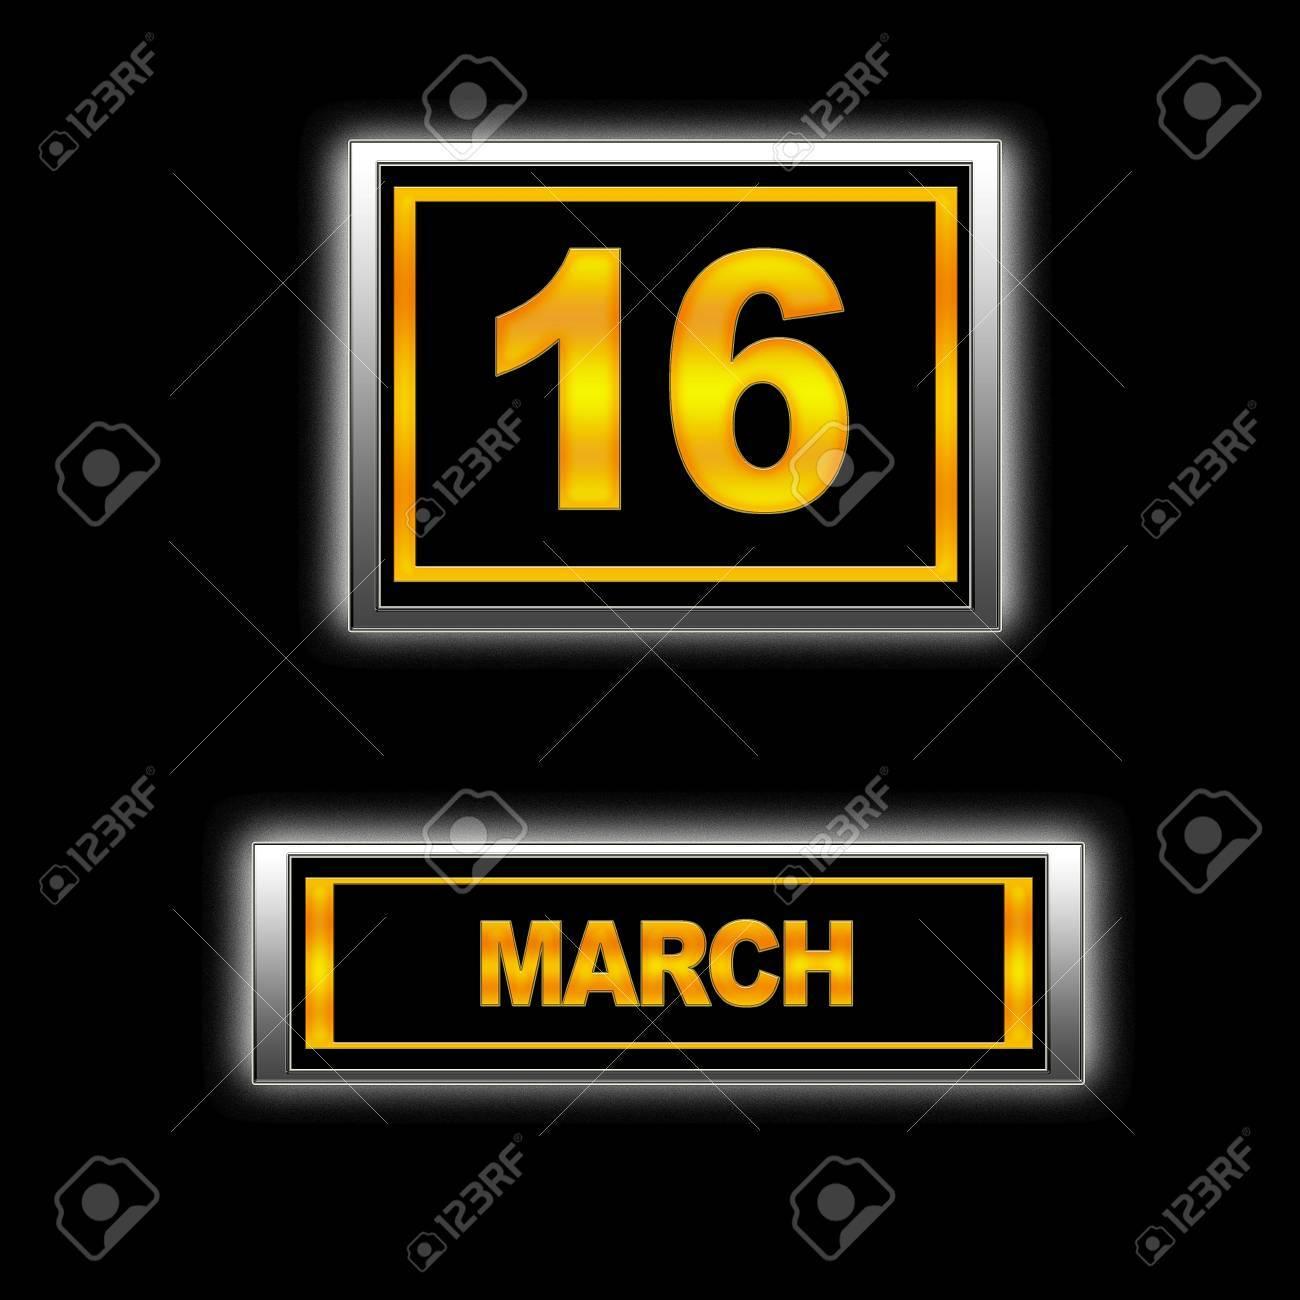 Illustration with Calendar, March 16 Stock Illustration - 13268167